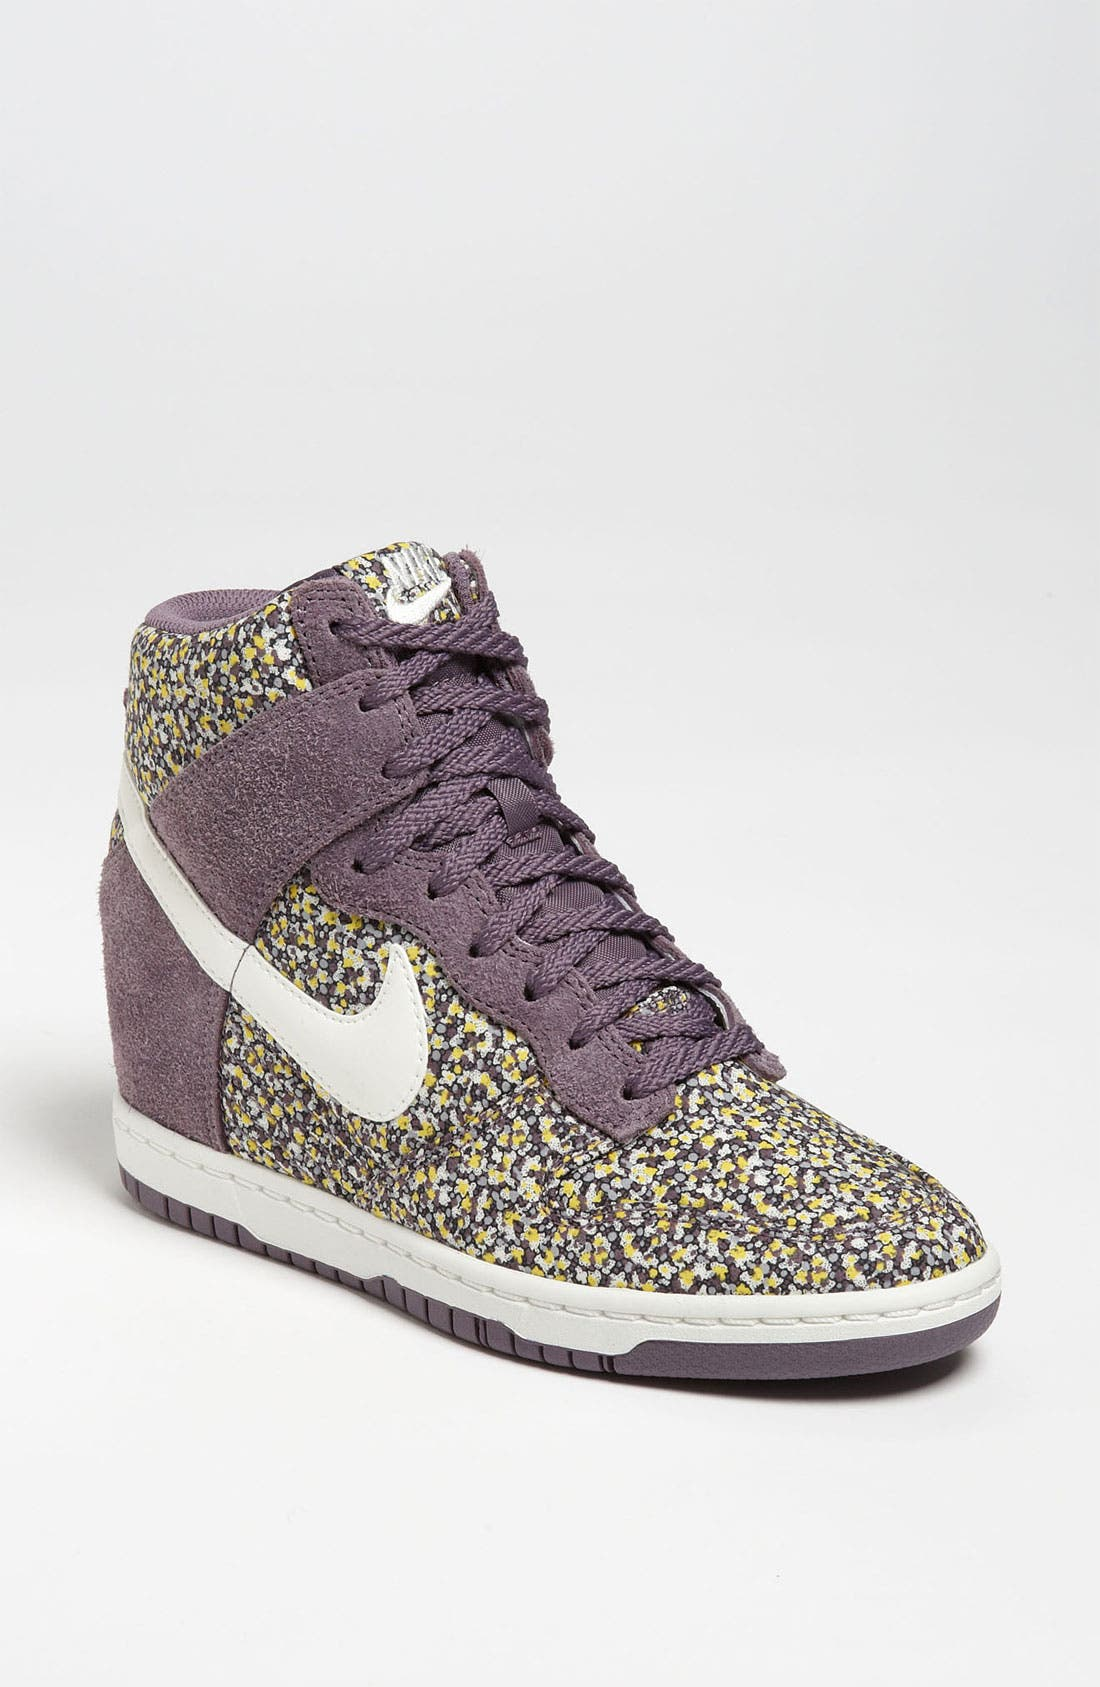 Alternate Image 1 Selected - Nike 'Dunk Sky Hi Liberty' Hidden Wedge Sneaker (Women)